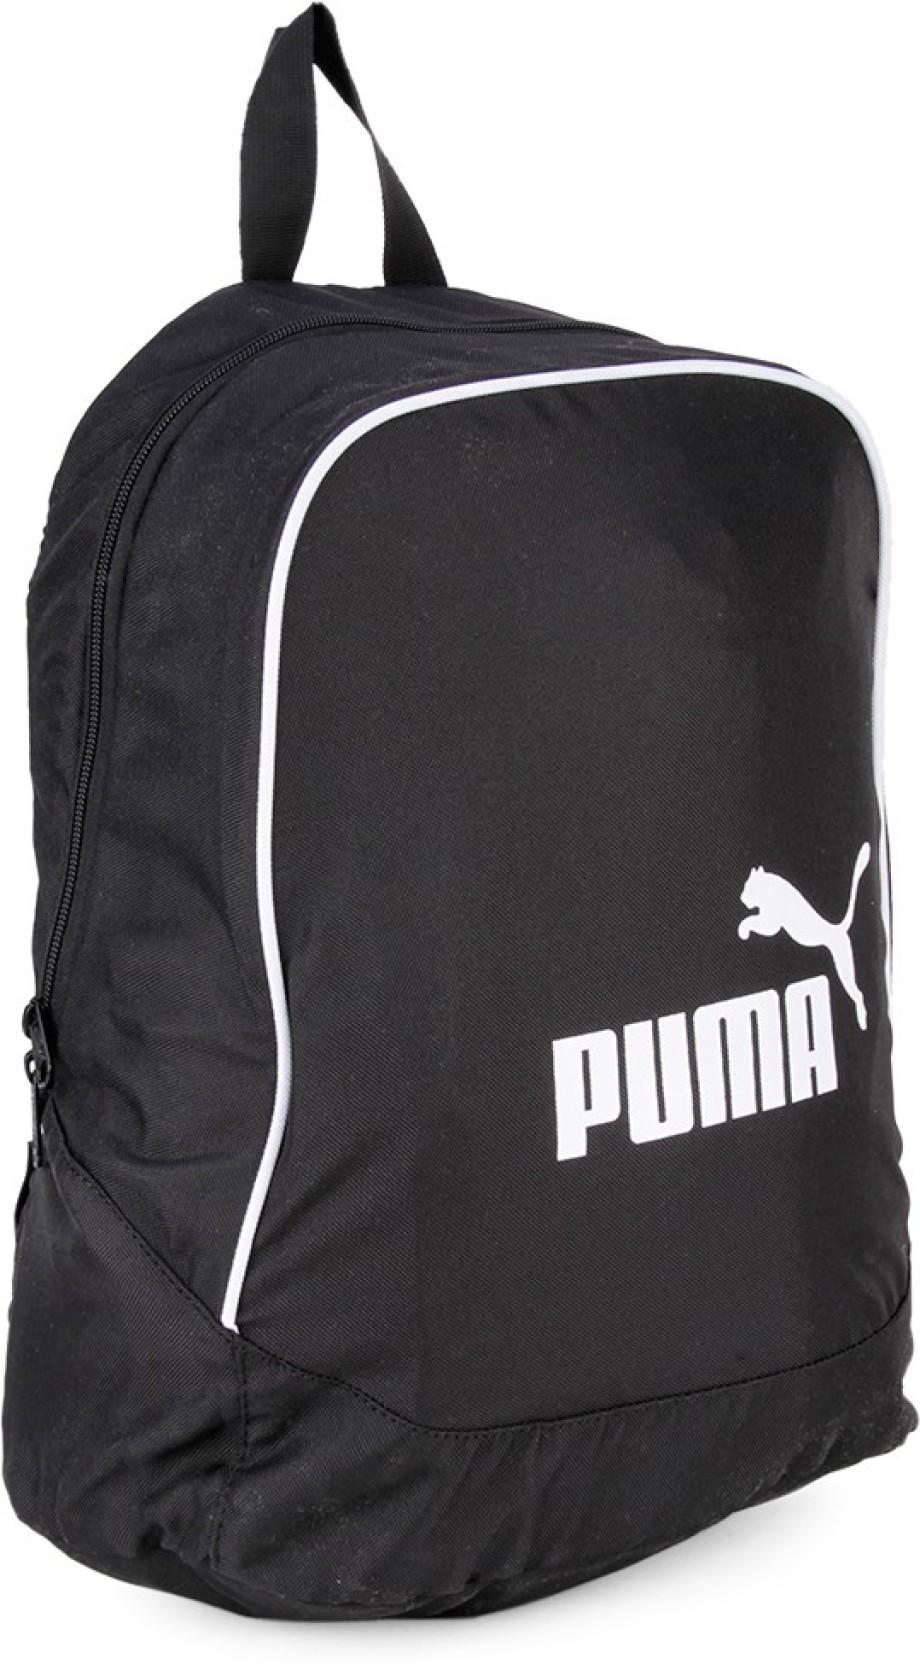 Puma Backpacks Bmw Bag Online – SimpleAccents. Sports Backpack Market 2018  Global Key Players † Nike b0adc01dde